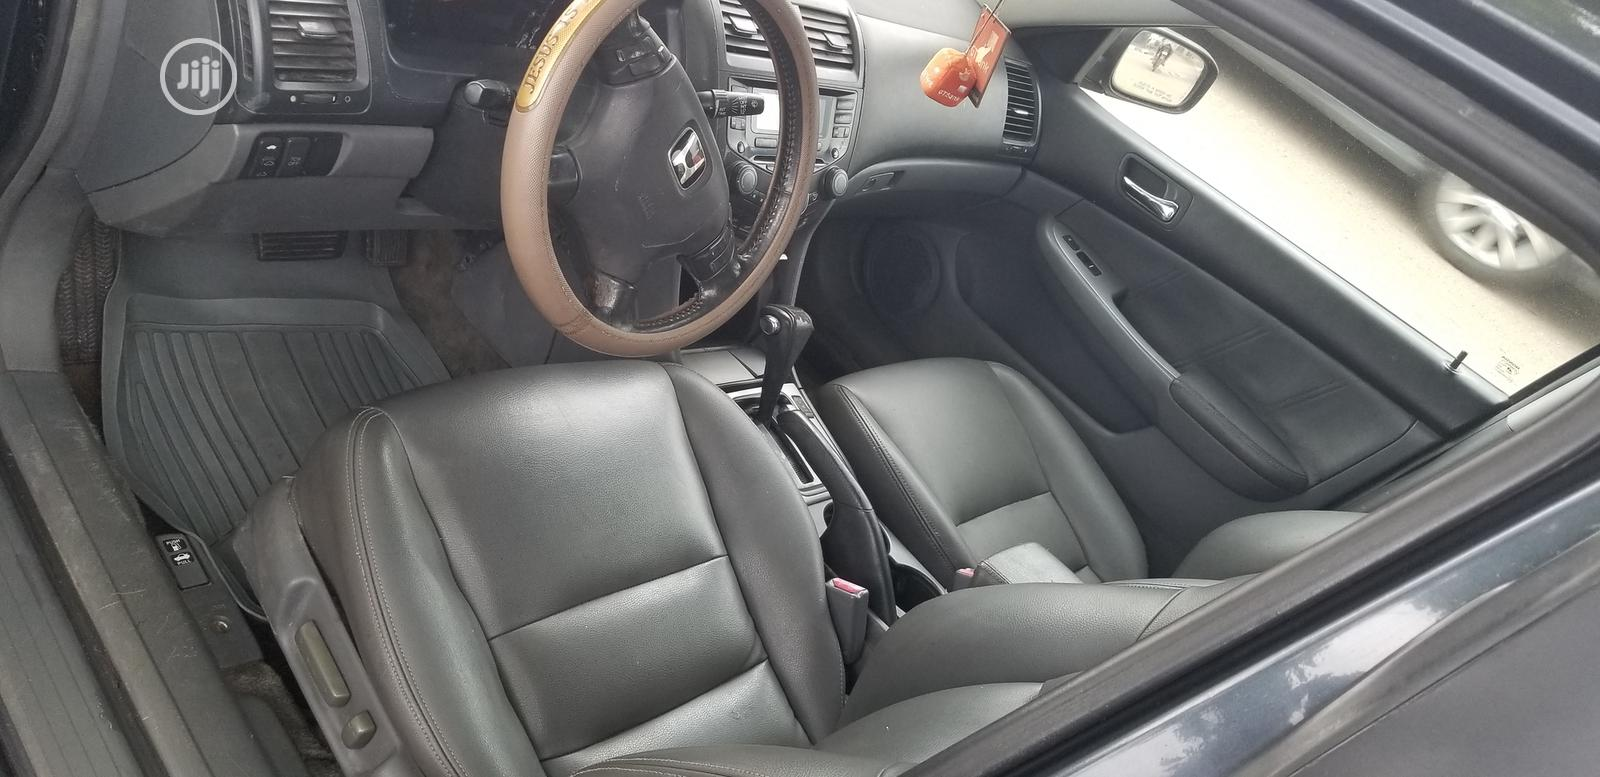 Archive: Honda Accord Automatic 2003 Gray